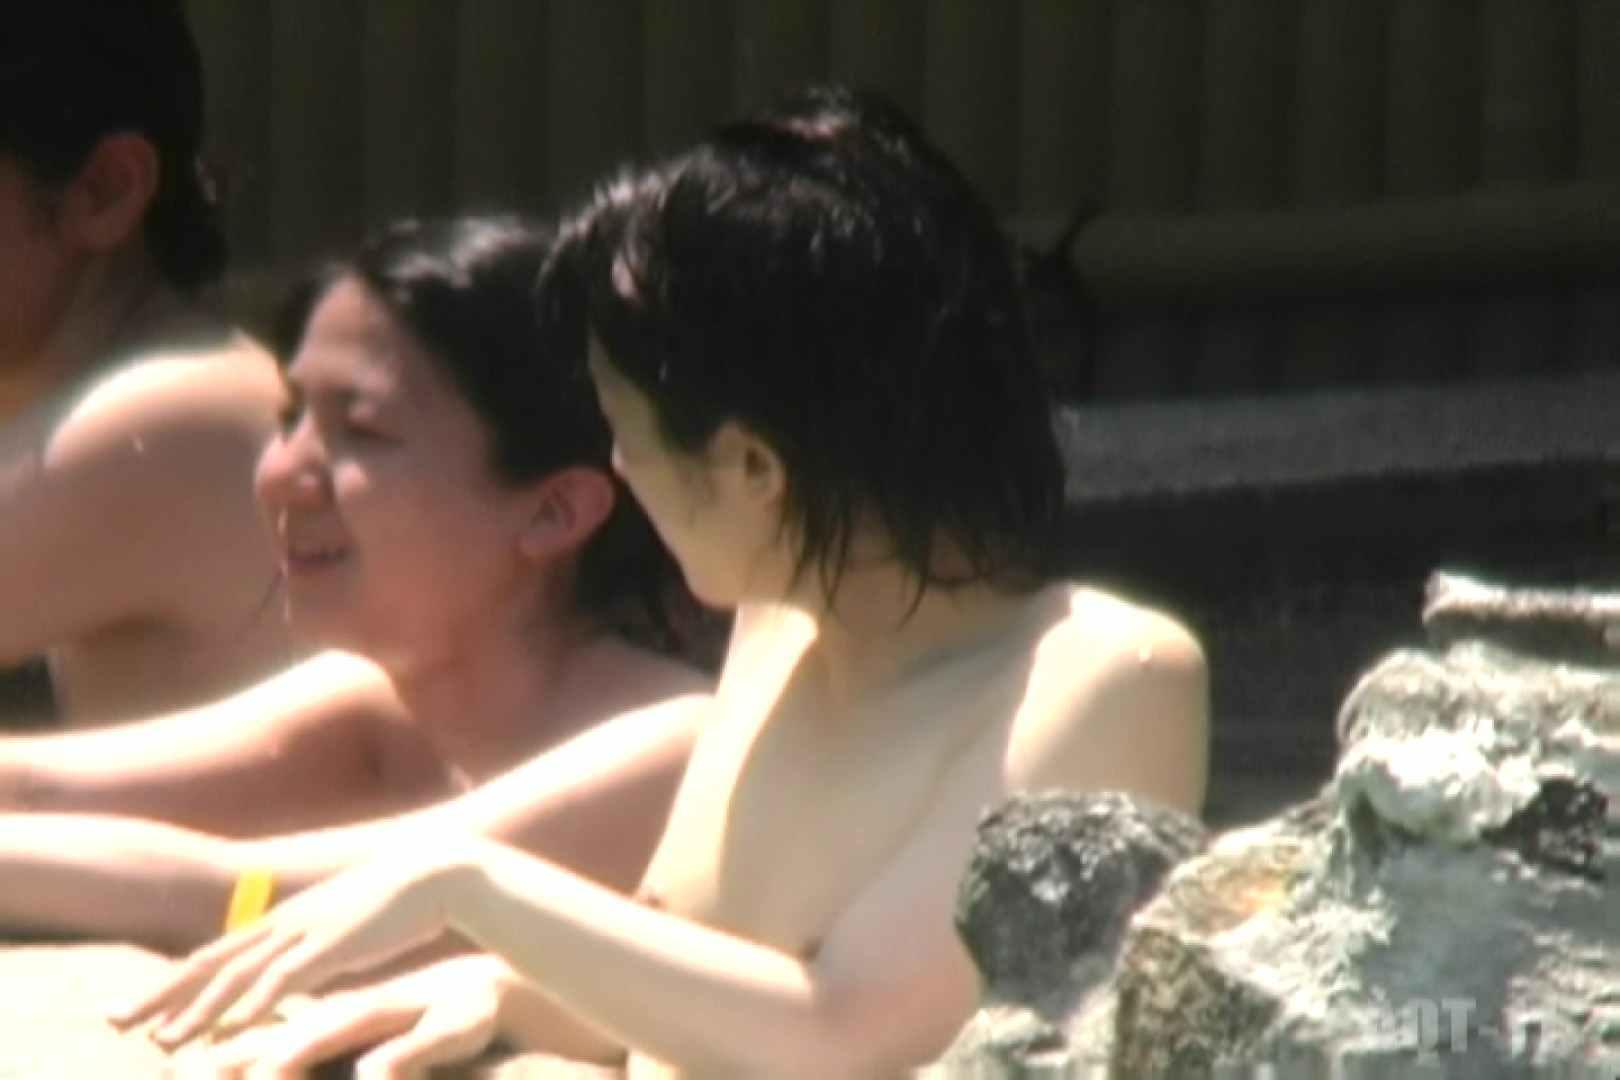 Aquaな露天風呂Vol.799 OL女体 すけべAV動画紹介 102連発 62